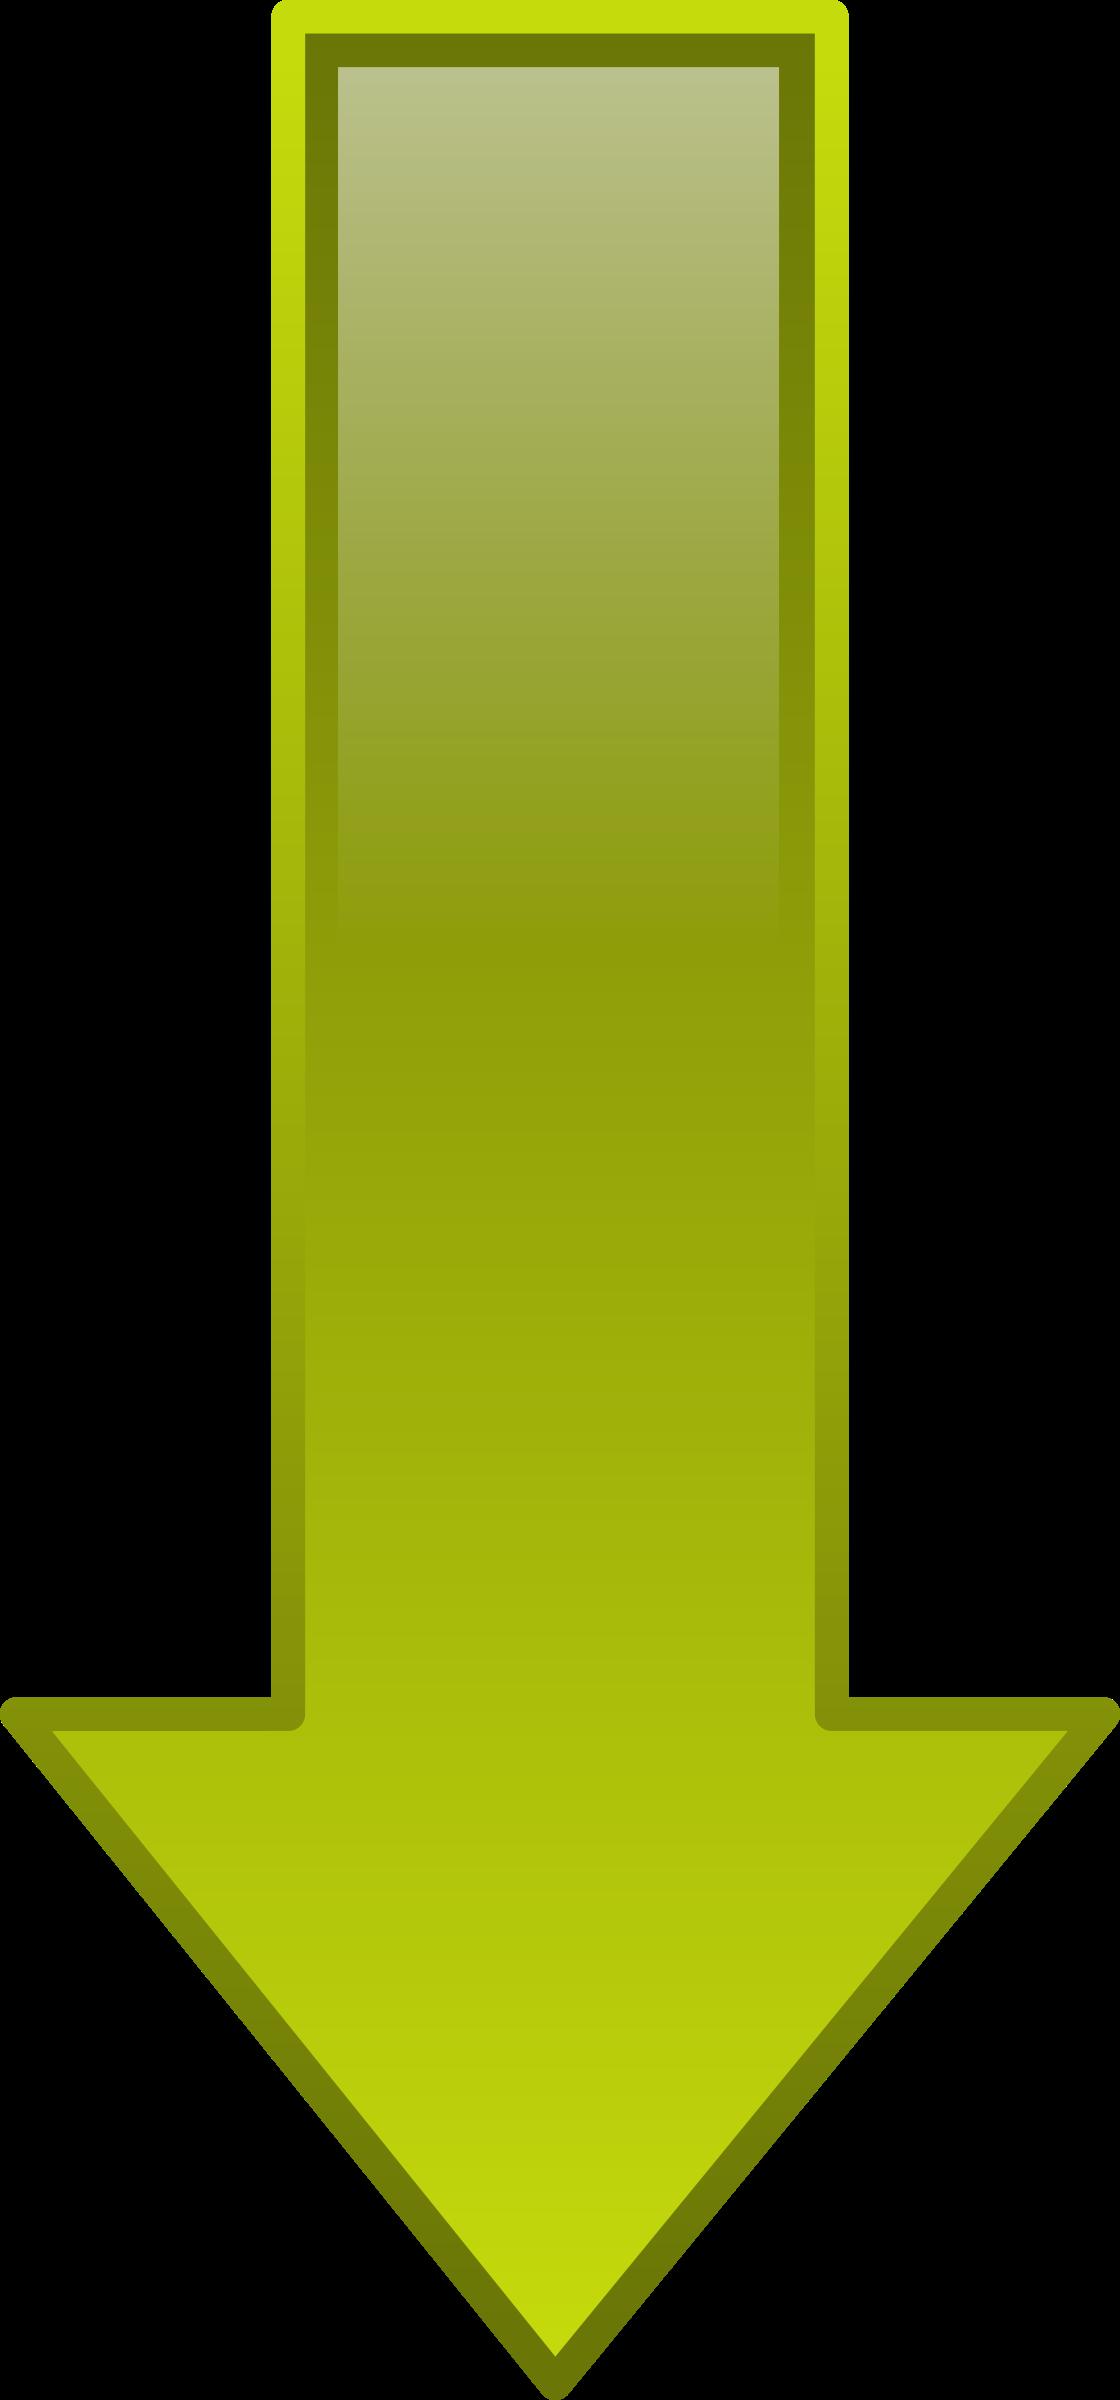 Clipart - Arrow Down Yellow